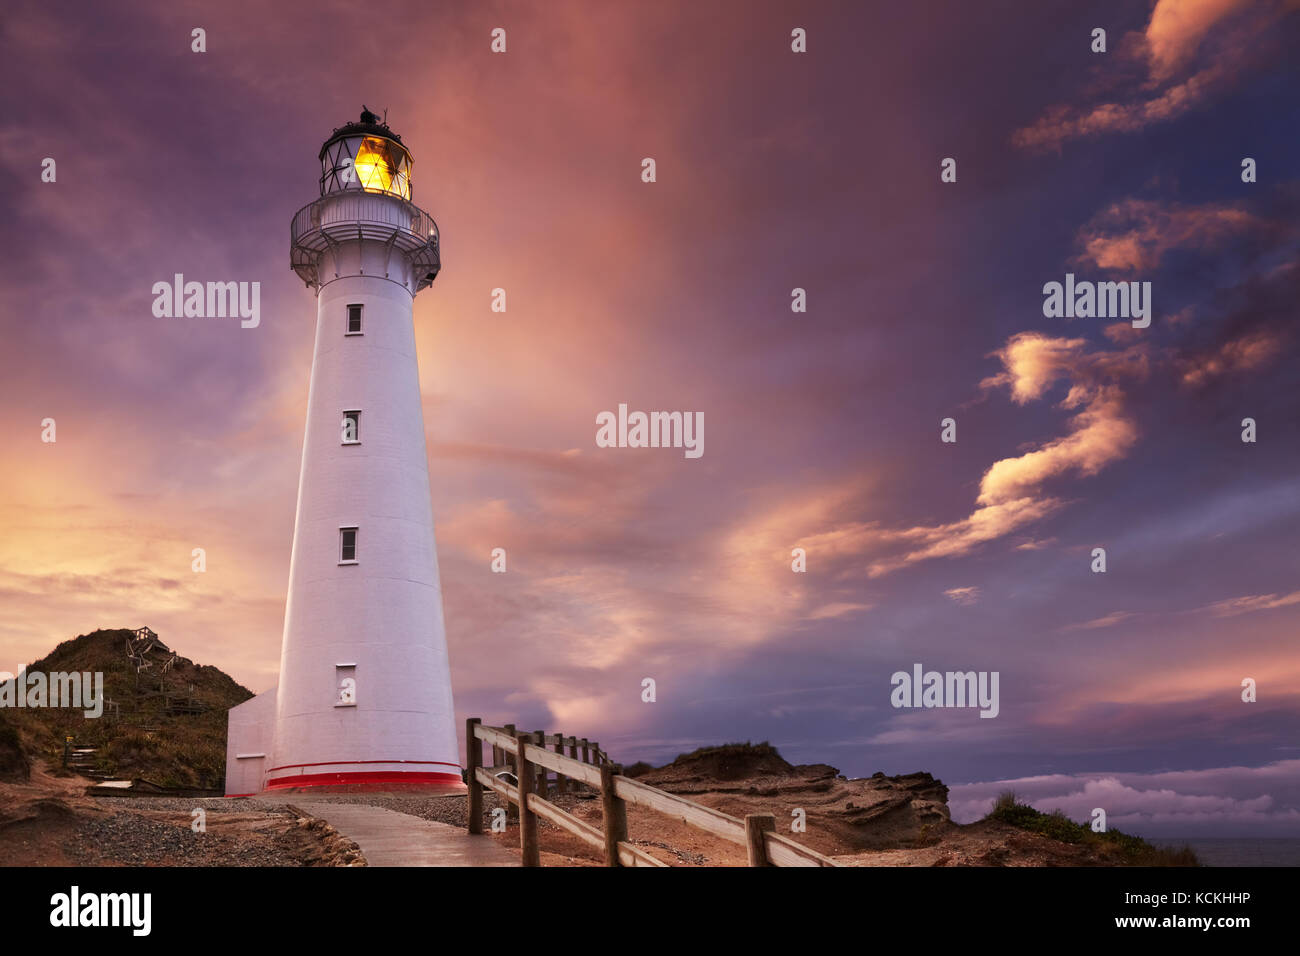 Castle Point Lighthouse, puesta de sol, wairarapa, Nueva Zelanda Imagen De Stock